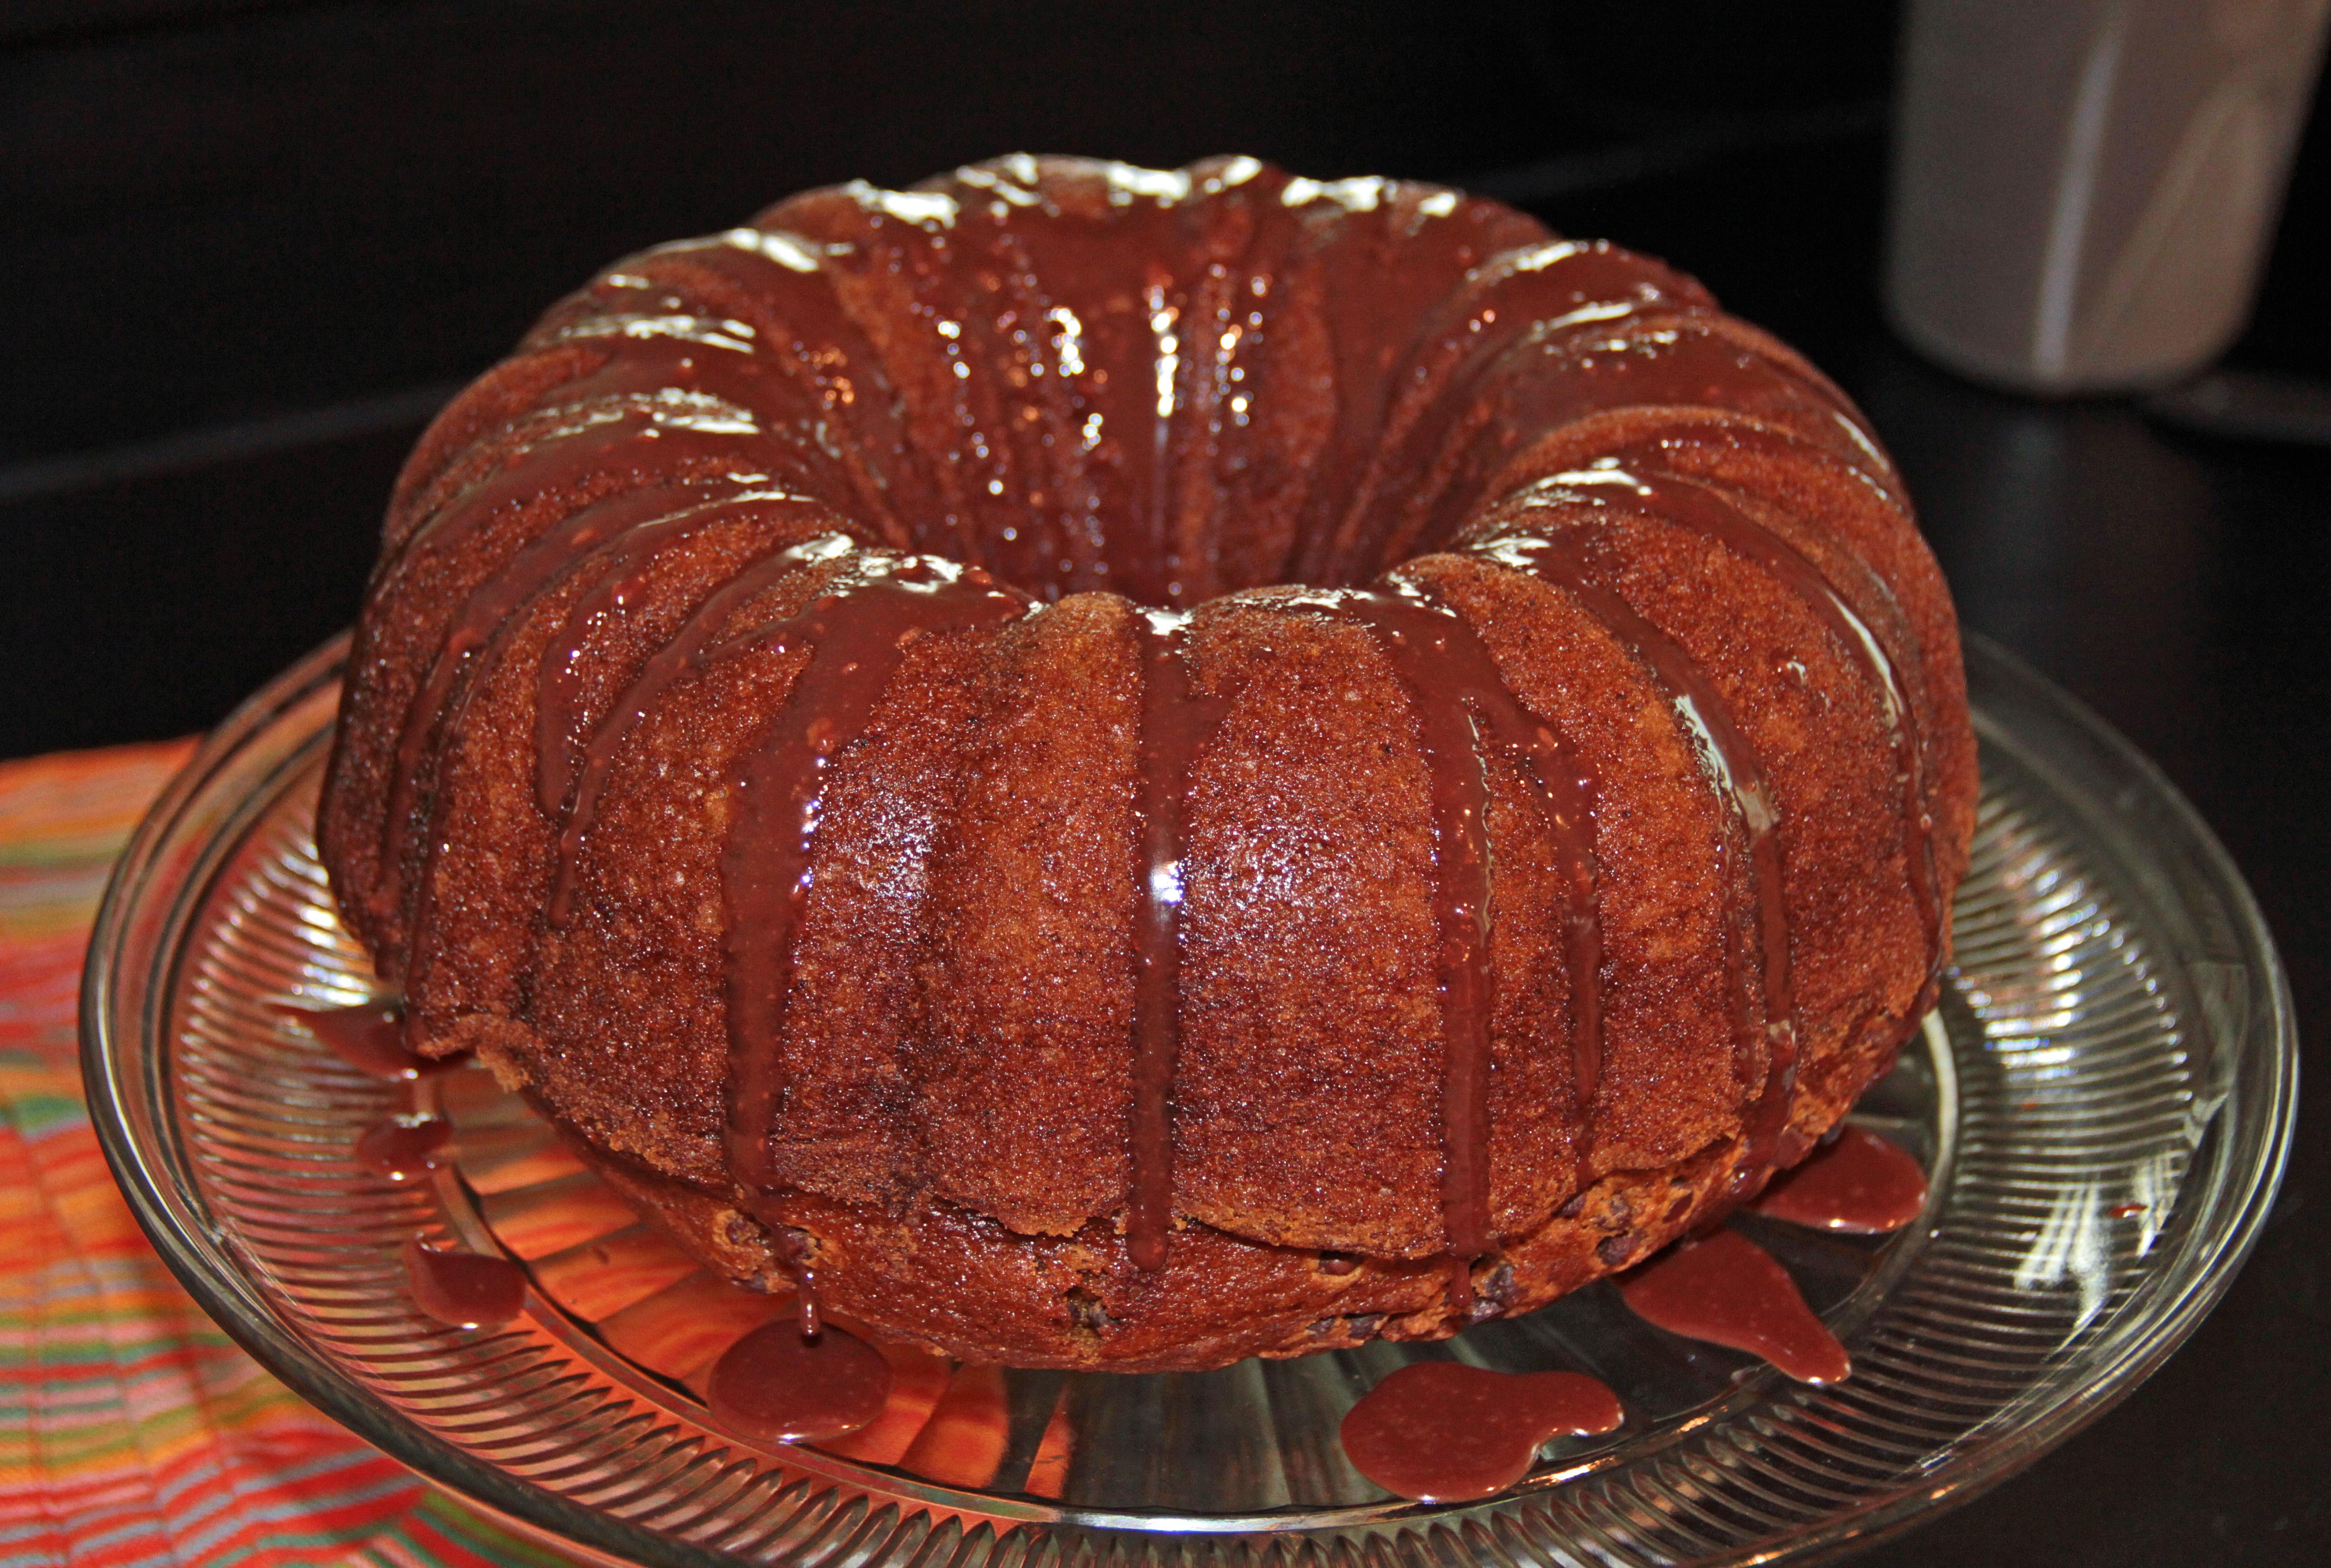 Pumpkin Bundt Cake with Nutella Glaze | Hollie's Hobbies